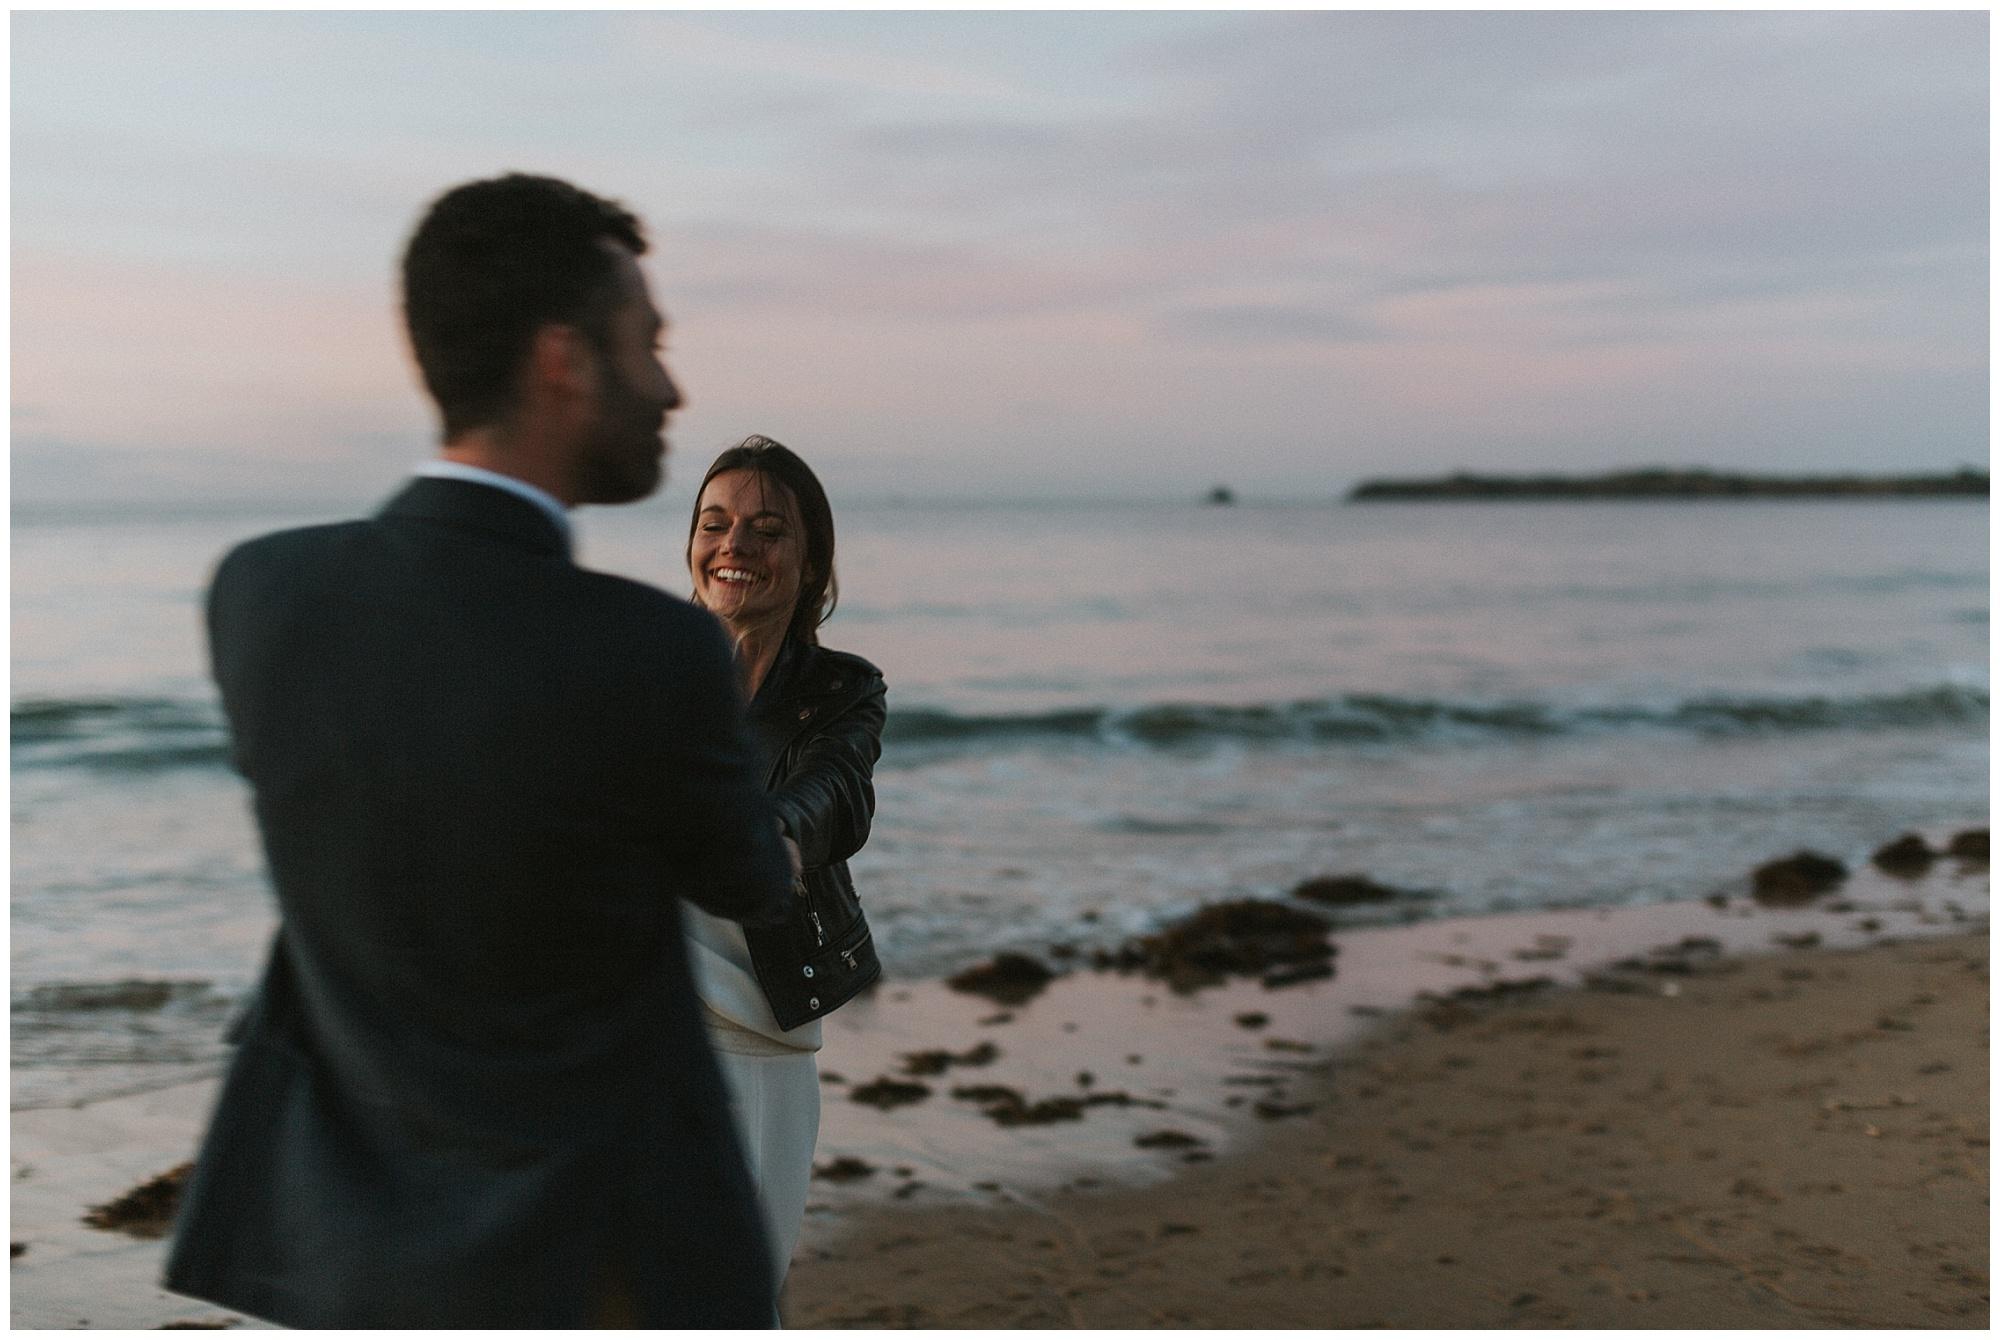 Kateryna-photos-photographe-mariage-bretagne-saint-malo-finistere-cotes-darmor-wedding_0104.jpg